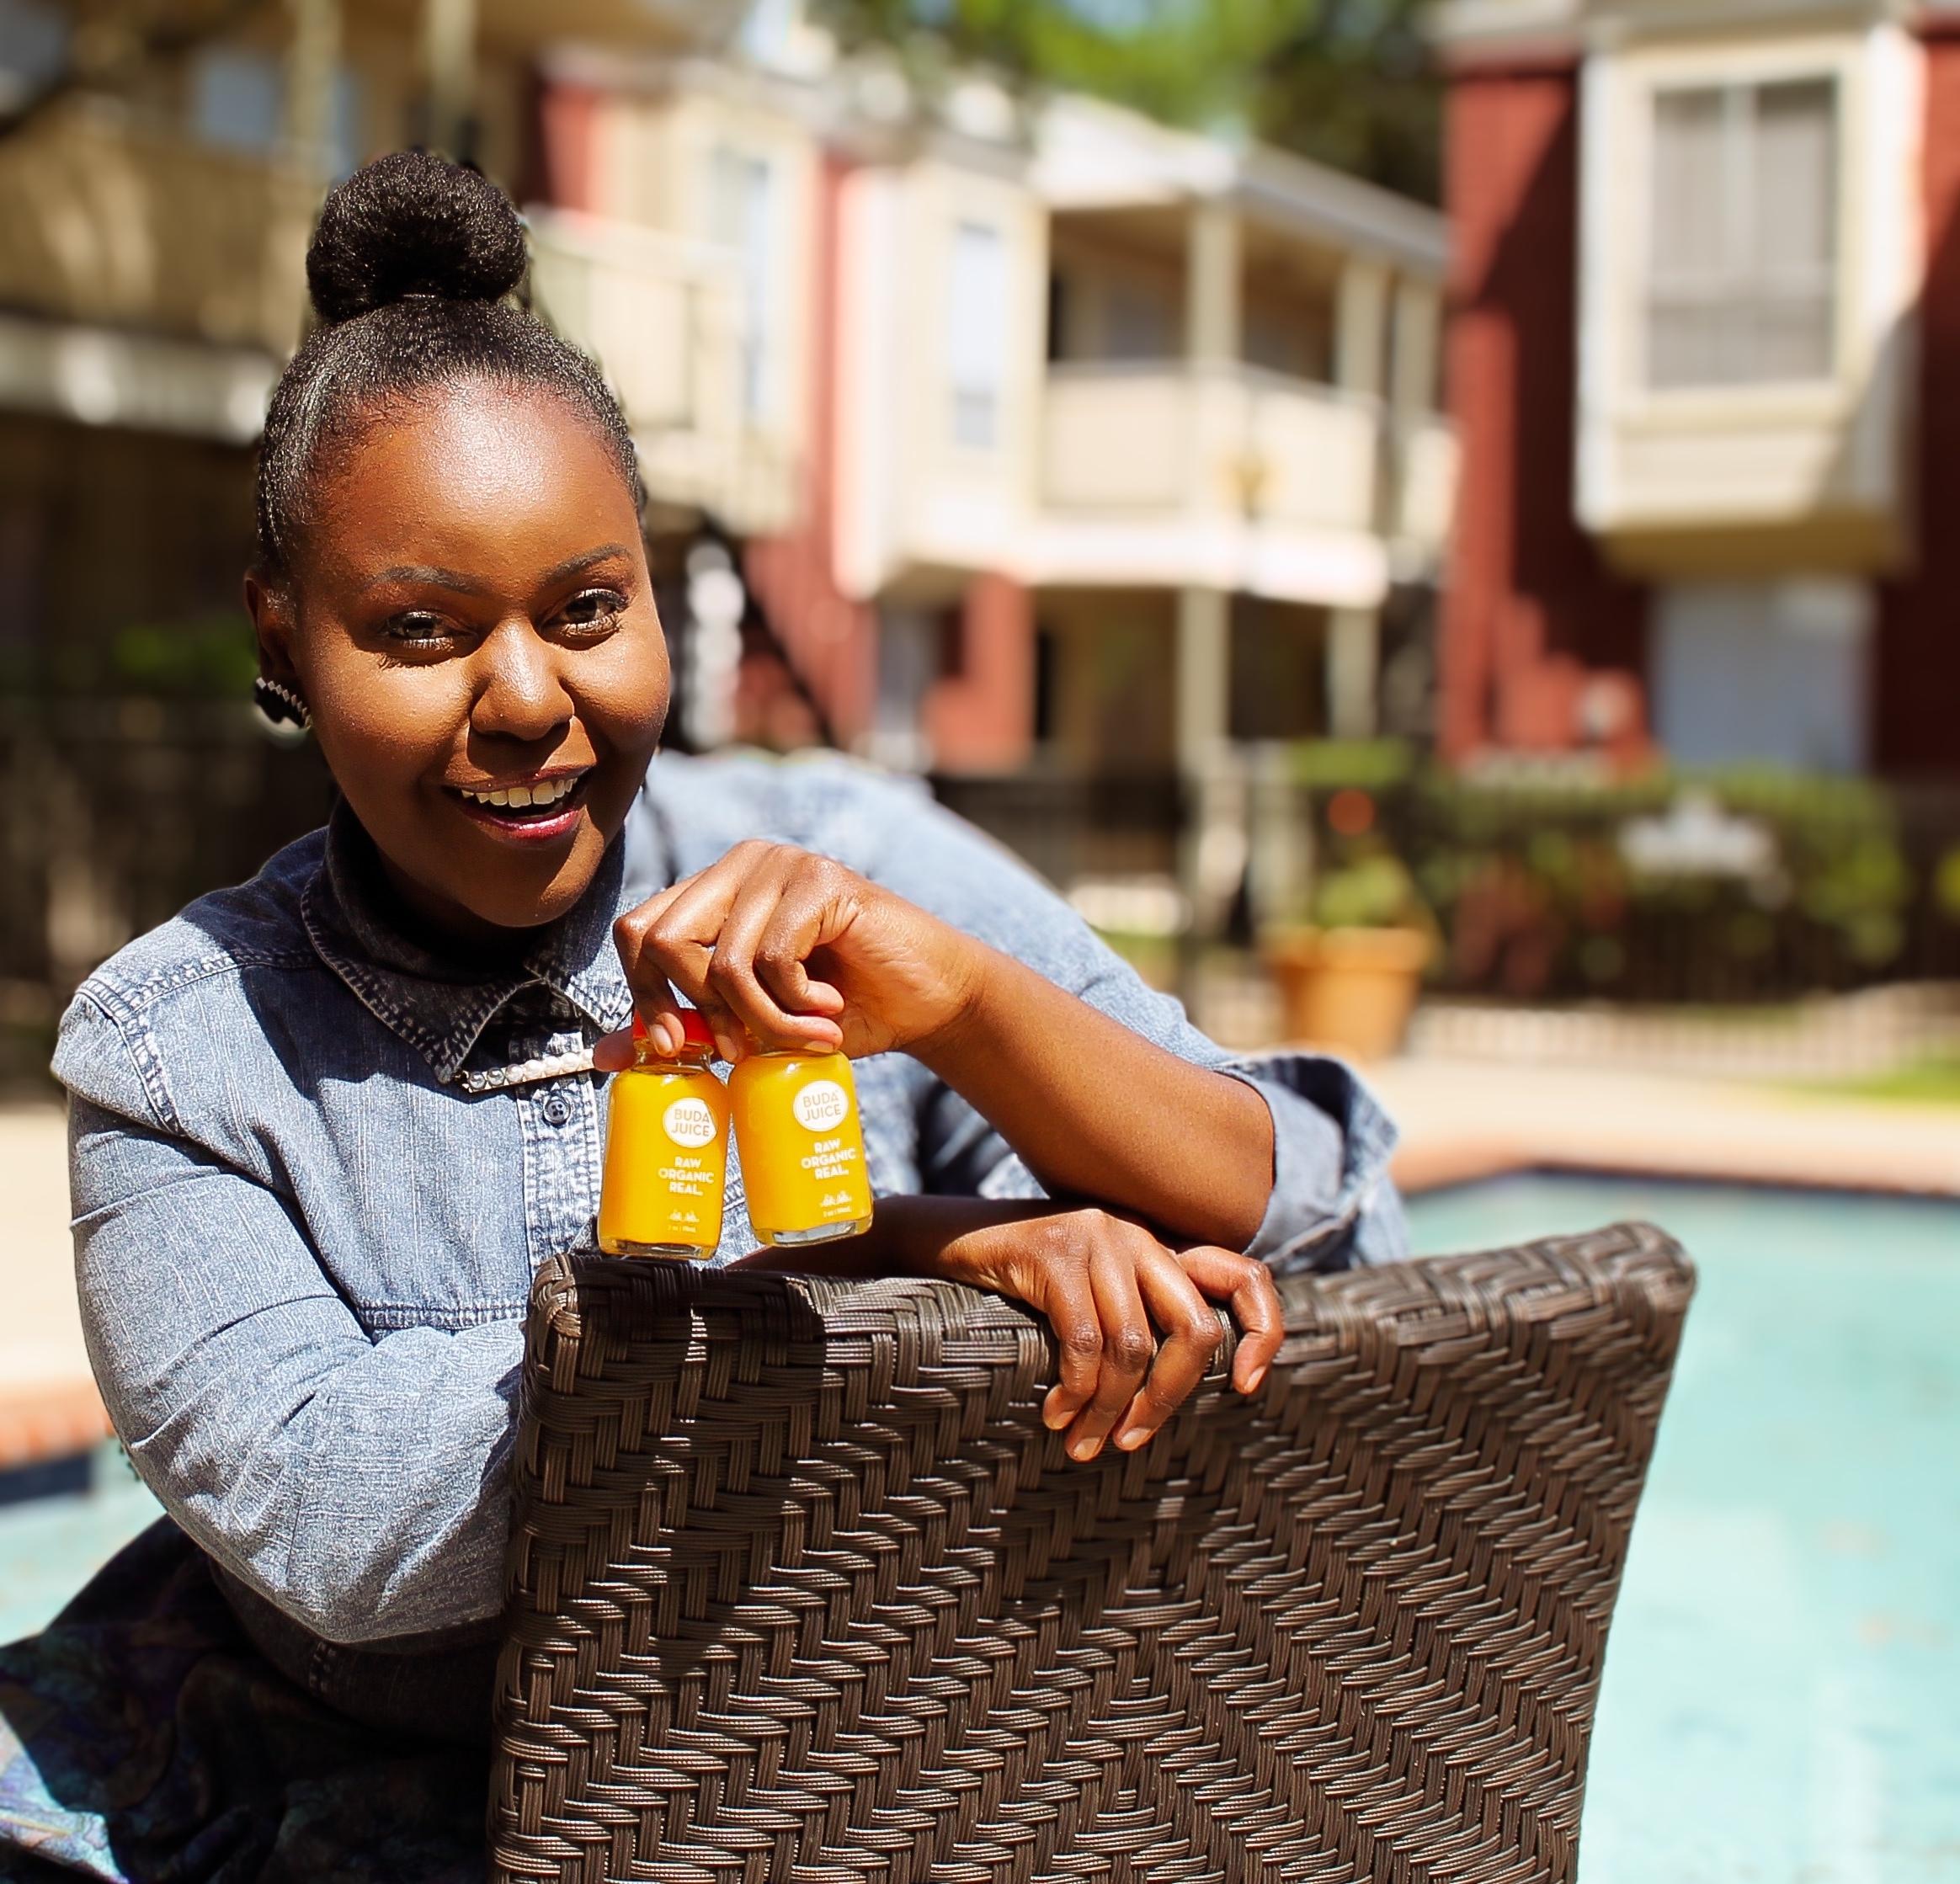 Immunity Boost, Buda Juice, Ginger Turmeric Shots Allergy Flu Season Immune system, wellness Allergies, pandemic, corona virus wellness, Gluten free, vegan, Houston blogger, dark skinned beauty lifestyle wellness blogger, Ugandan blogger Uganda healthy, eat clean